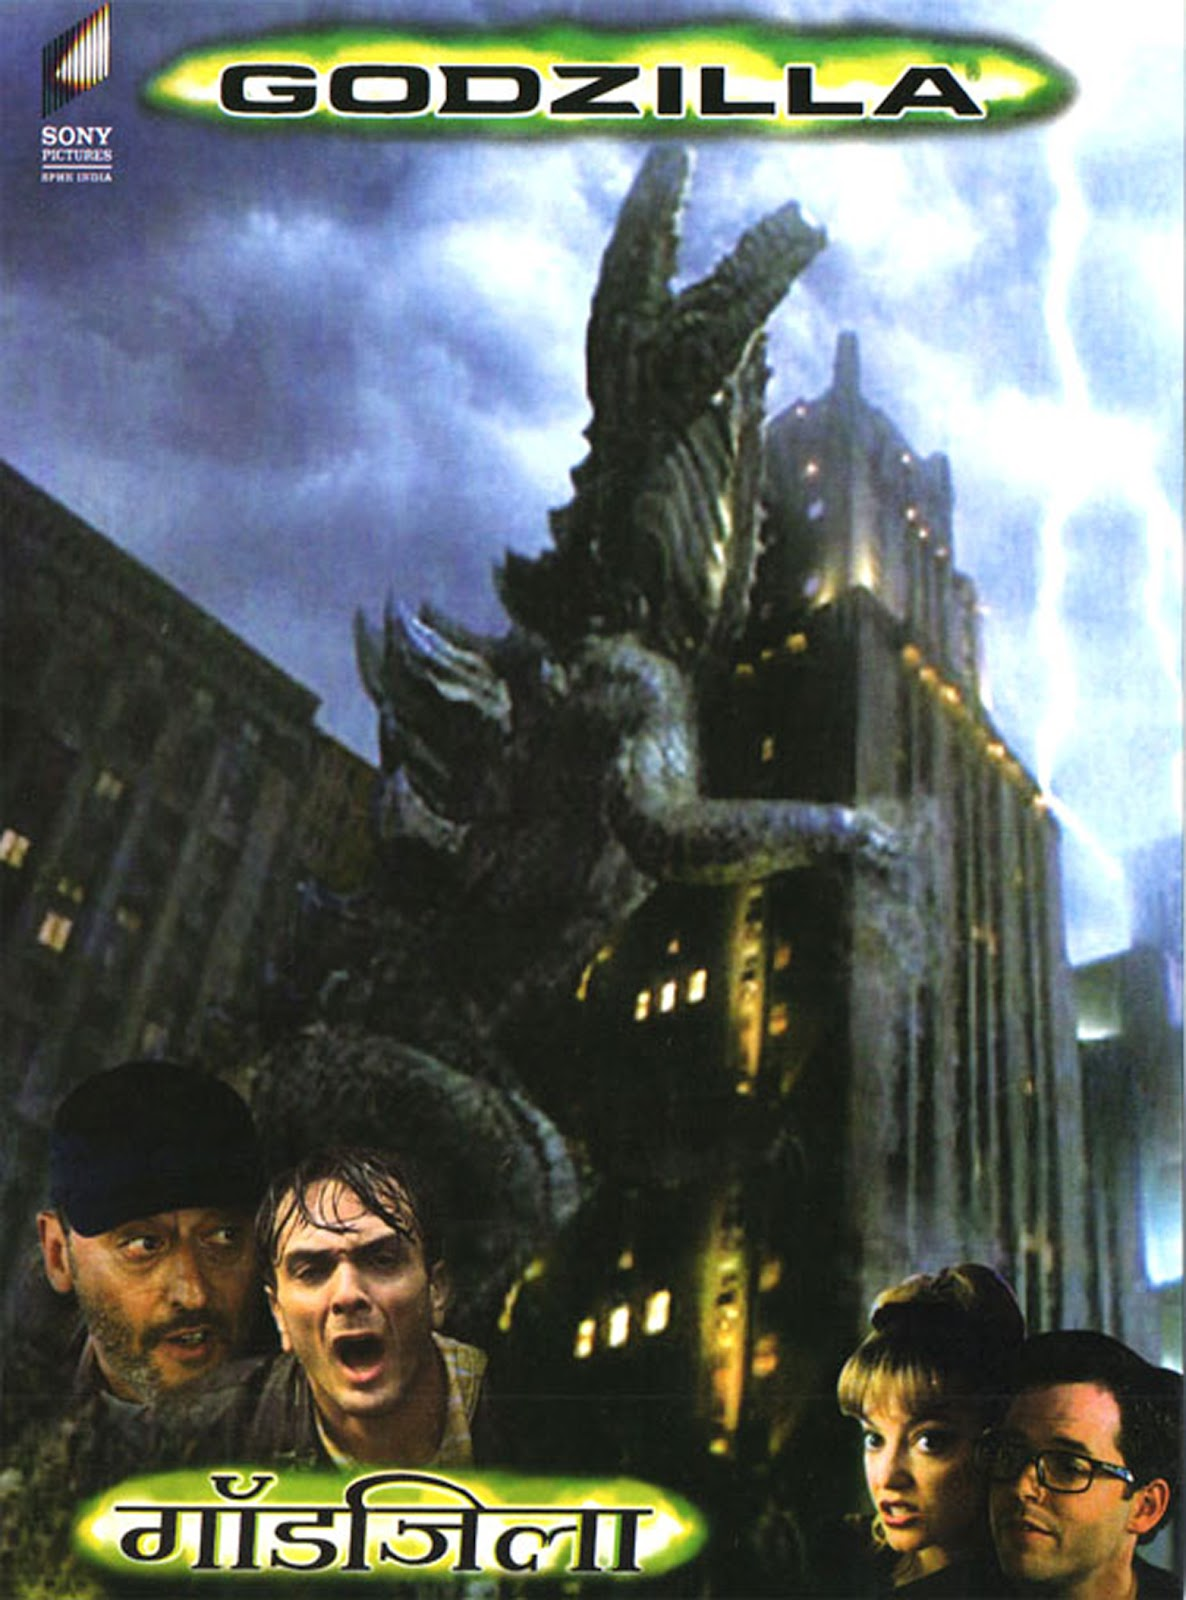 http://2.bp.blogspot.com/-JbiD1LHGxTg/UGq7obyYfdI/AAAAAAAAALk/uJDE-R34eaM/s1600/Godzilla+-+IDH+21739.jpg